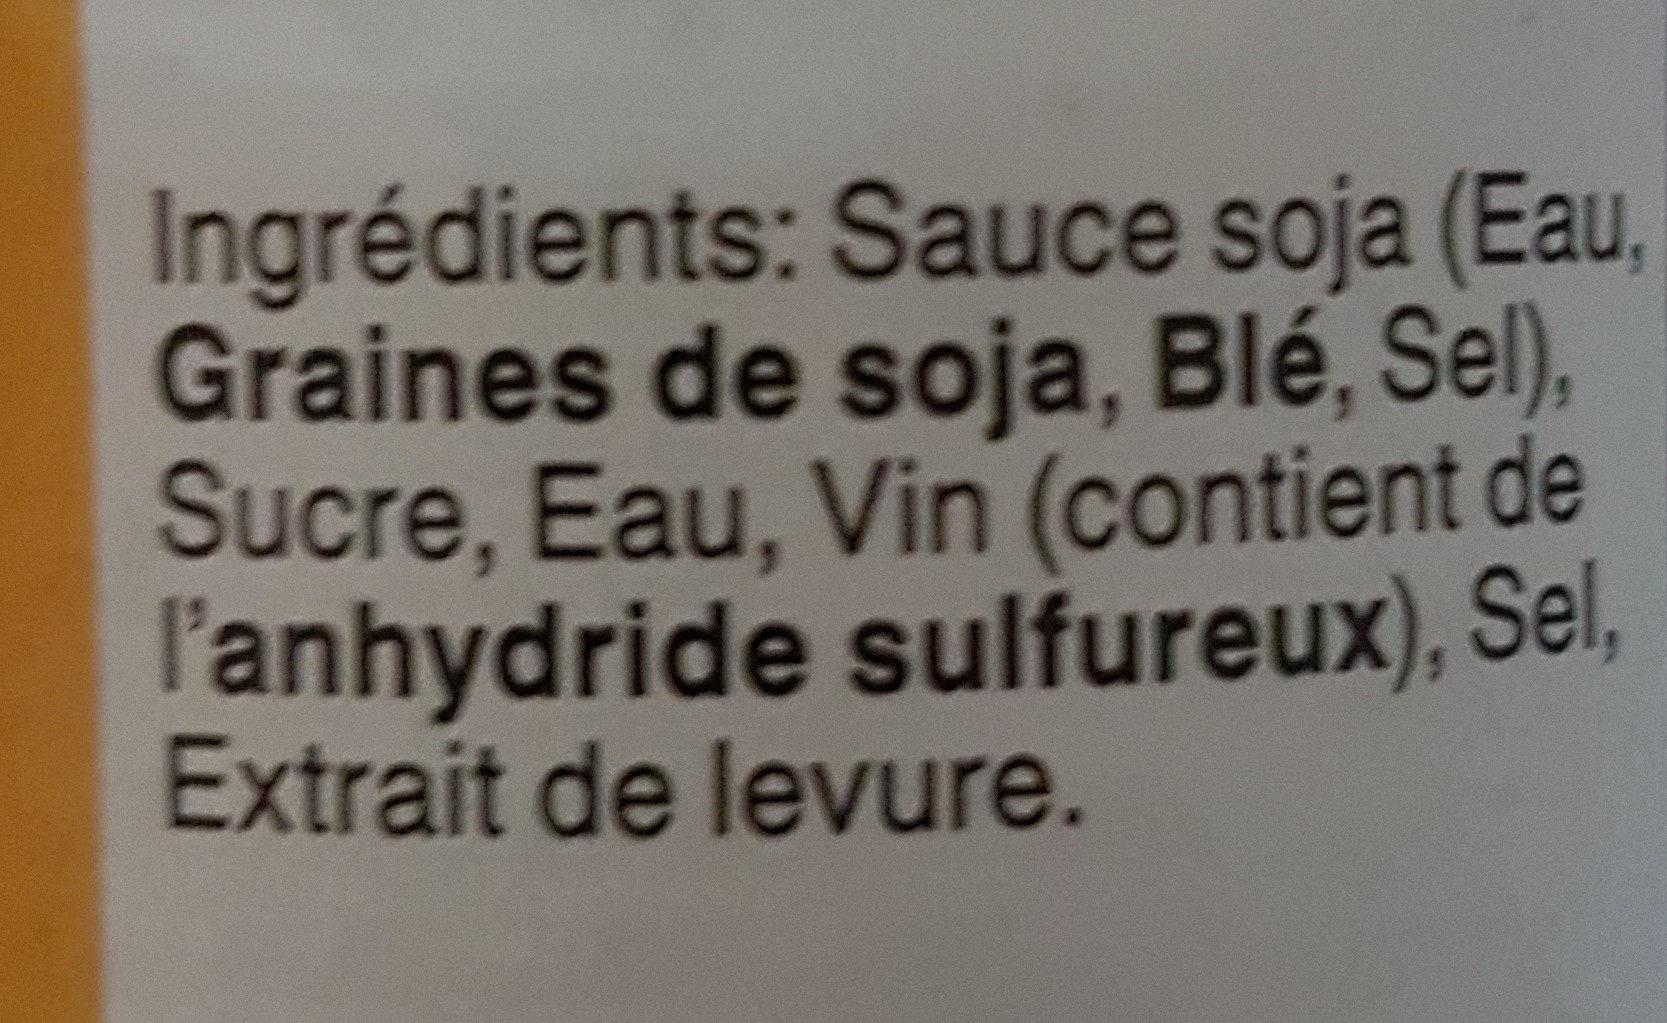 Sauce wok rapide et savoureux - Ingredienser - fr